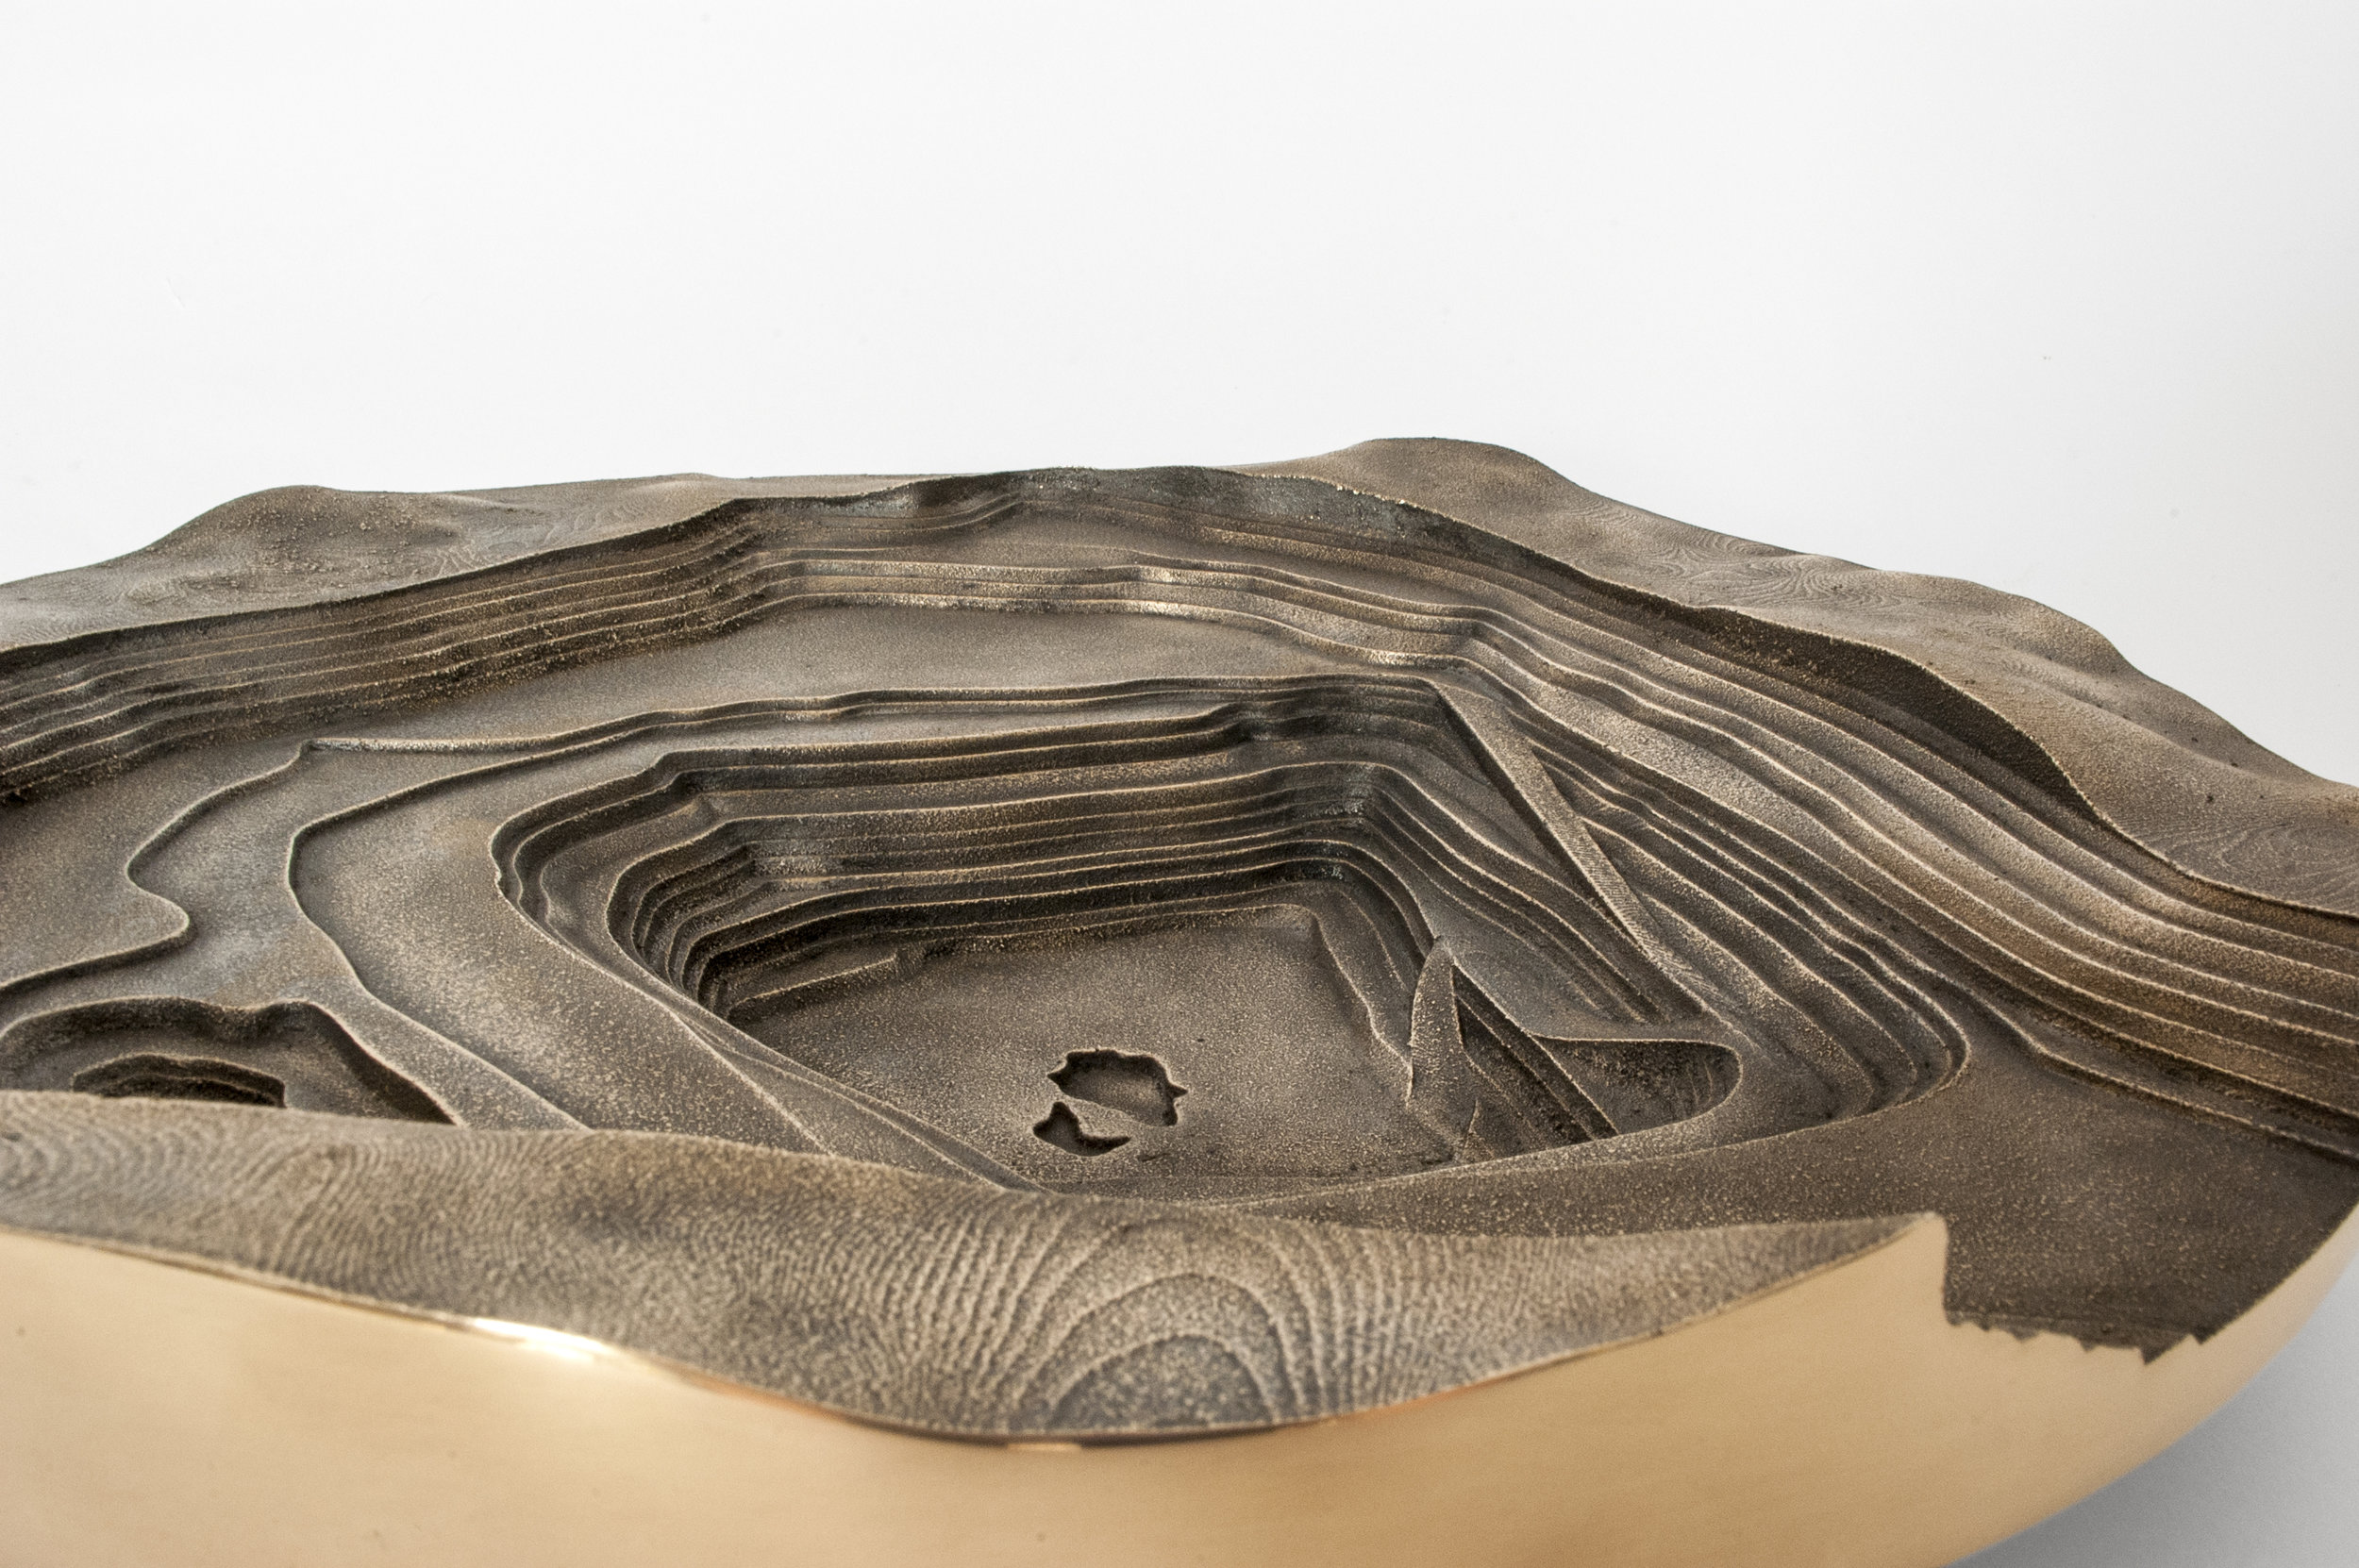 Copper Mining bowl detail 1 - David Derksen Design.jpg